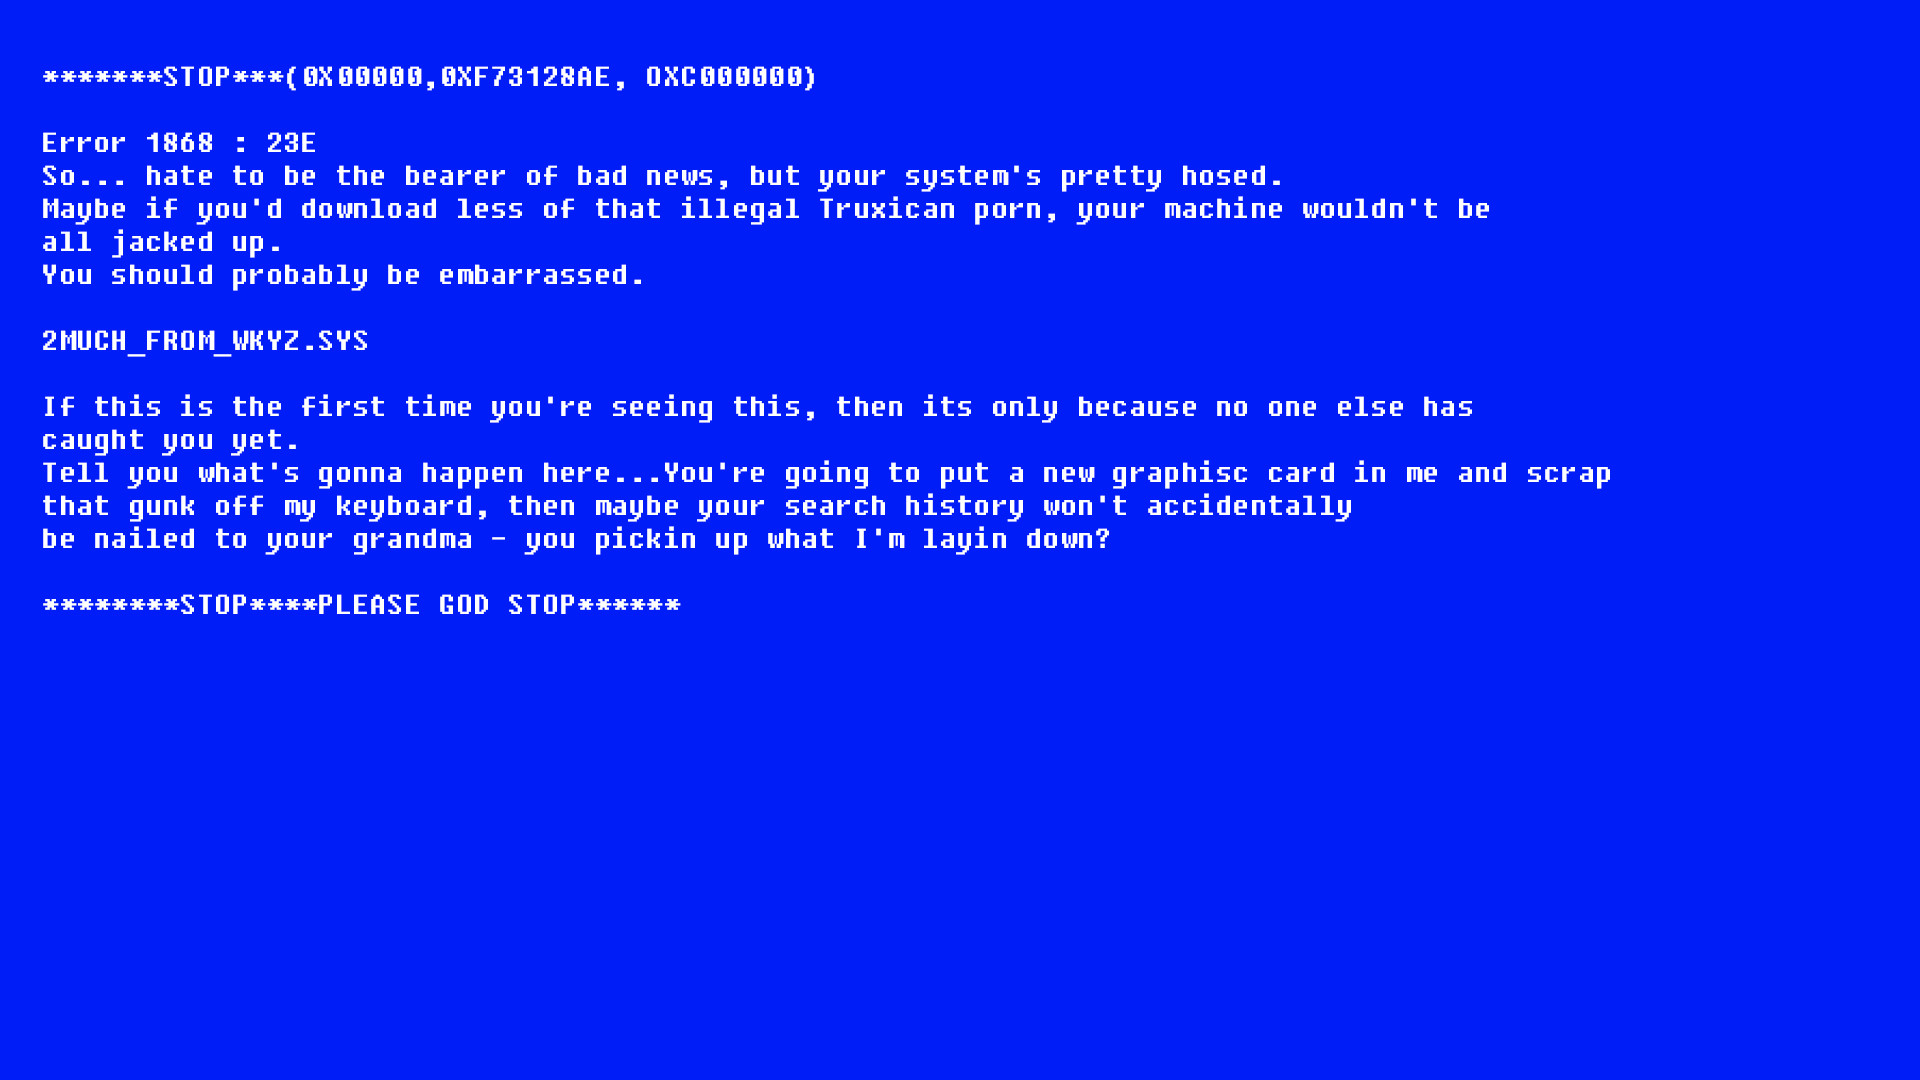 made the blue screen easteregg into a wallpaper iimgurcom 1920x1080